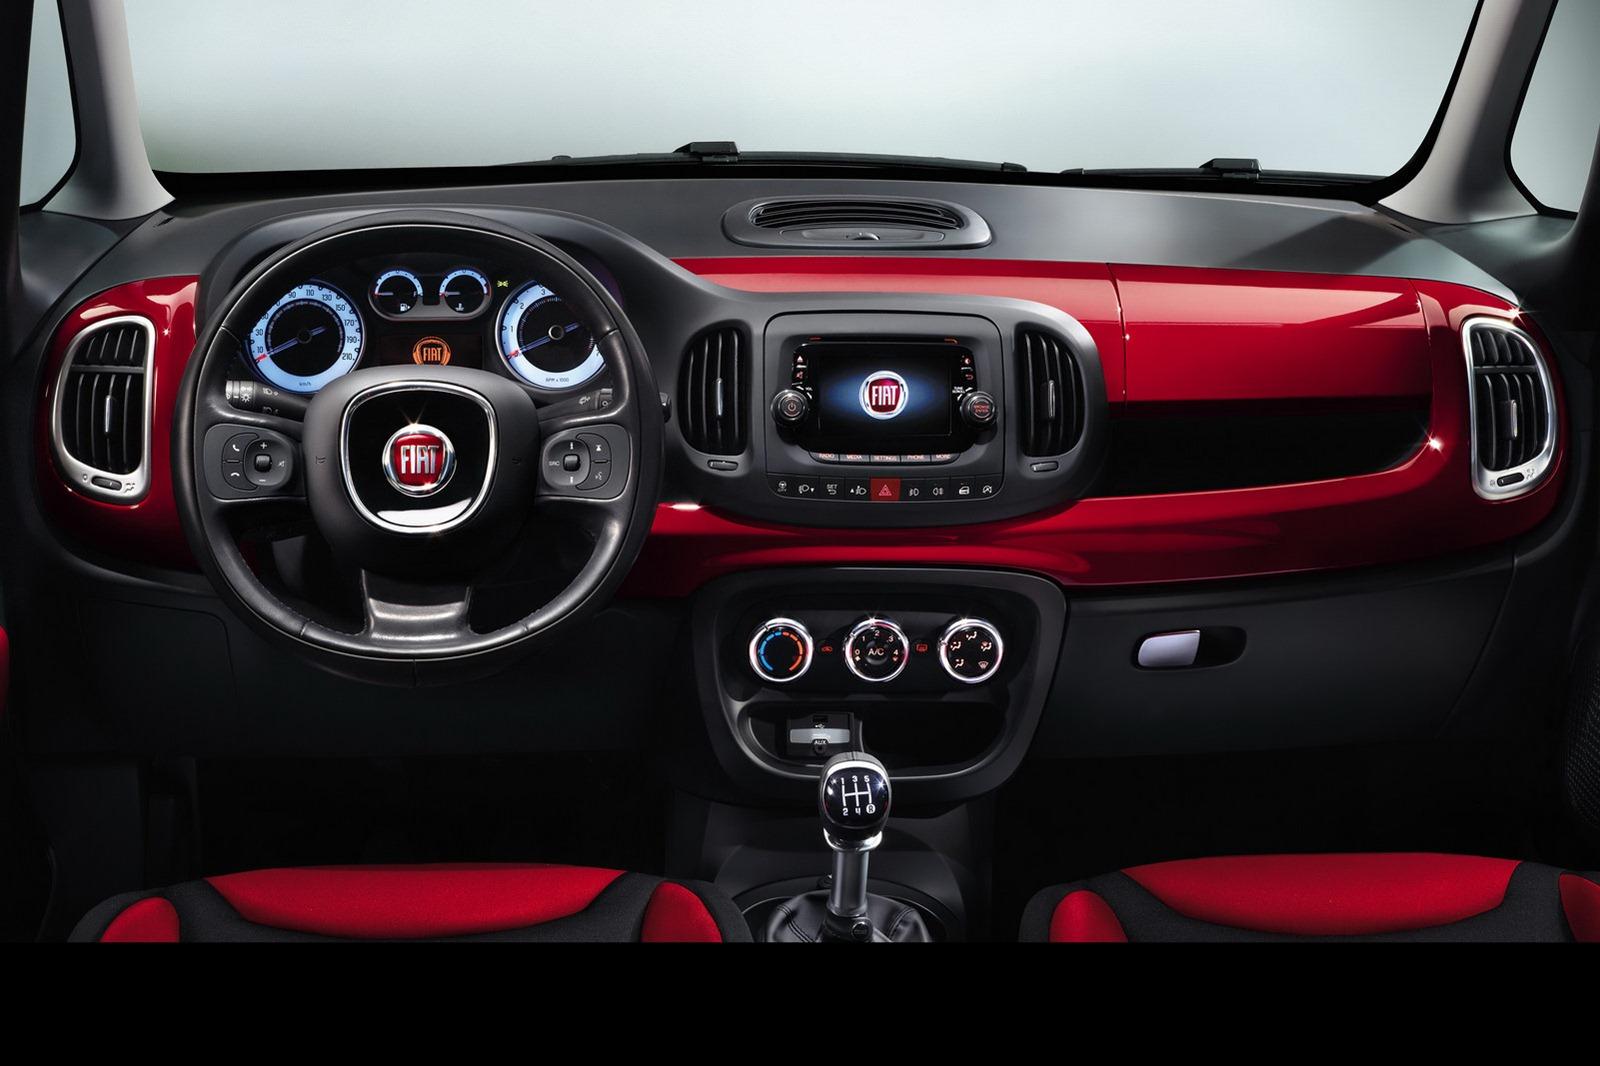 Fiat-500x-inside